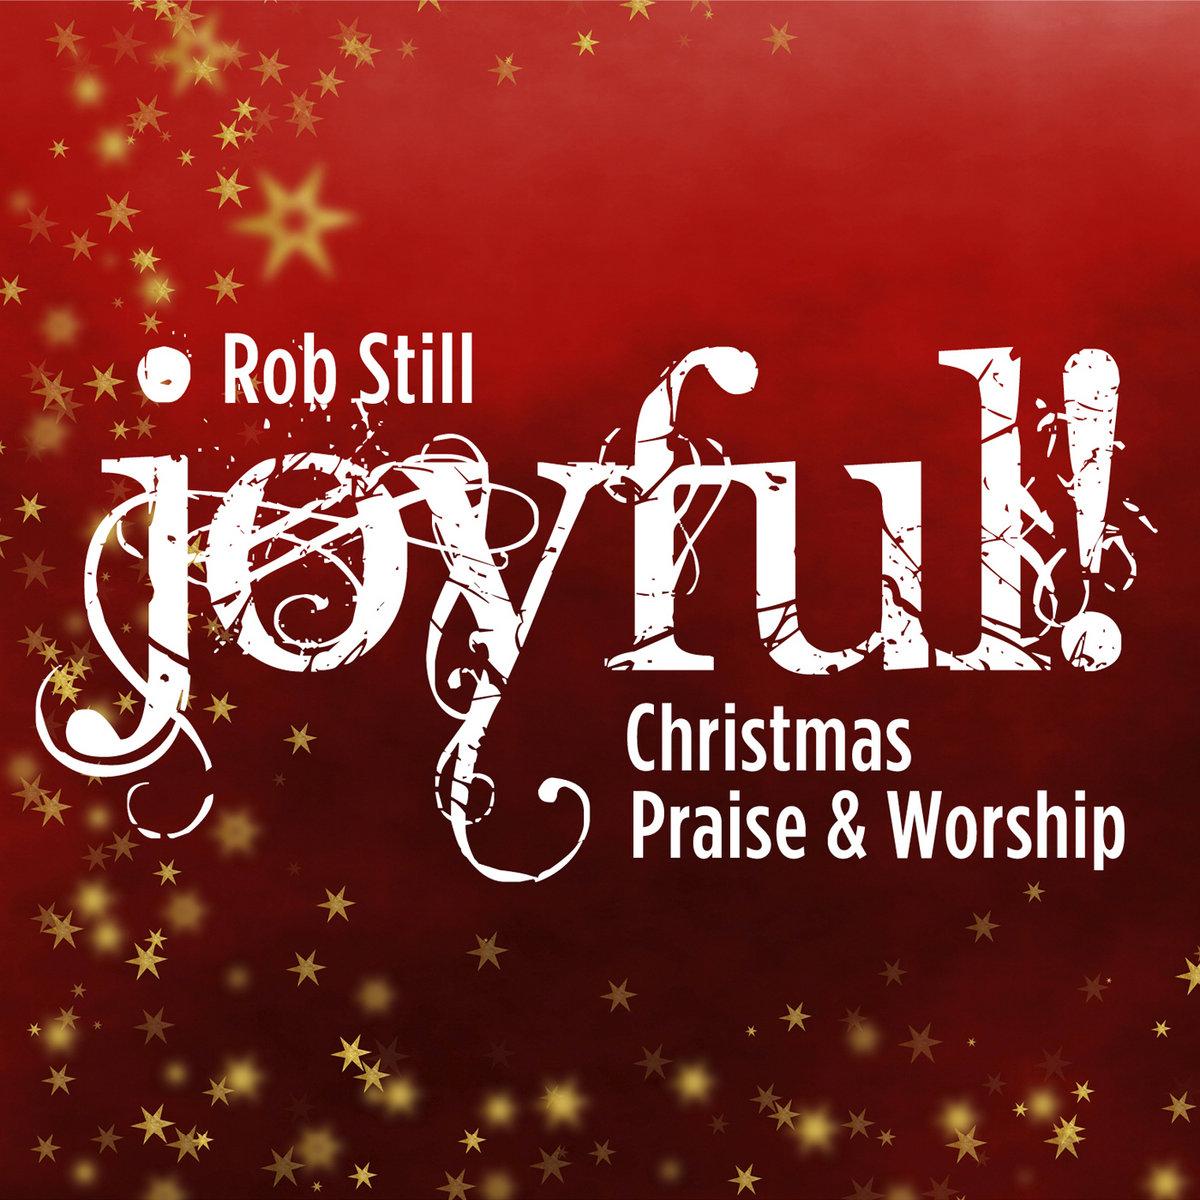 JOYFUL! Christmas Praise & Worship | Rob Still